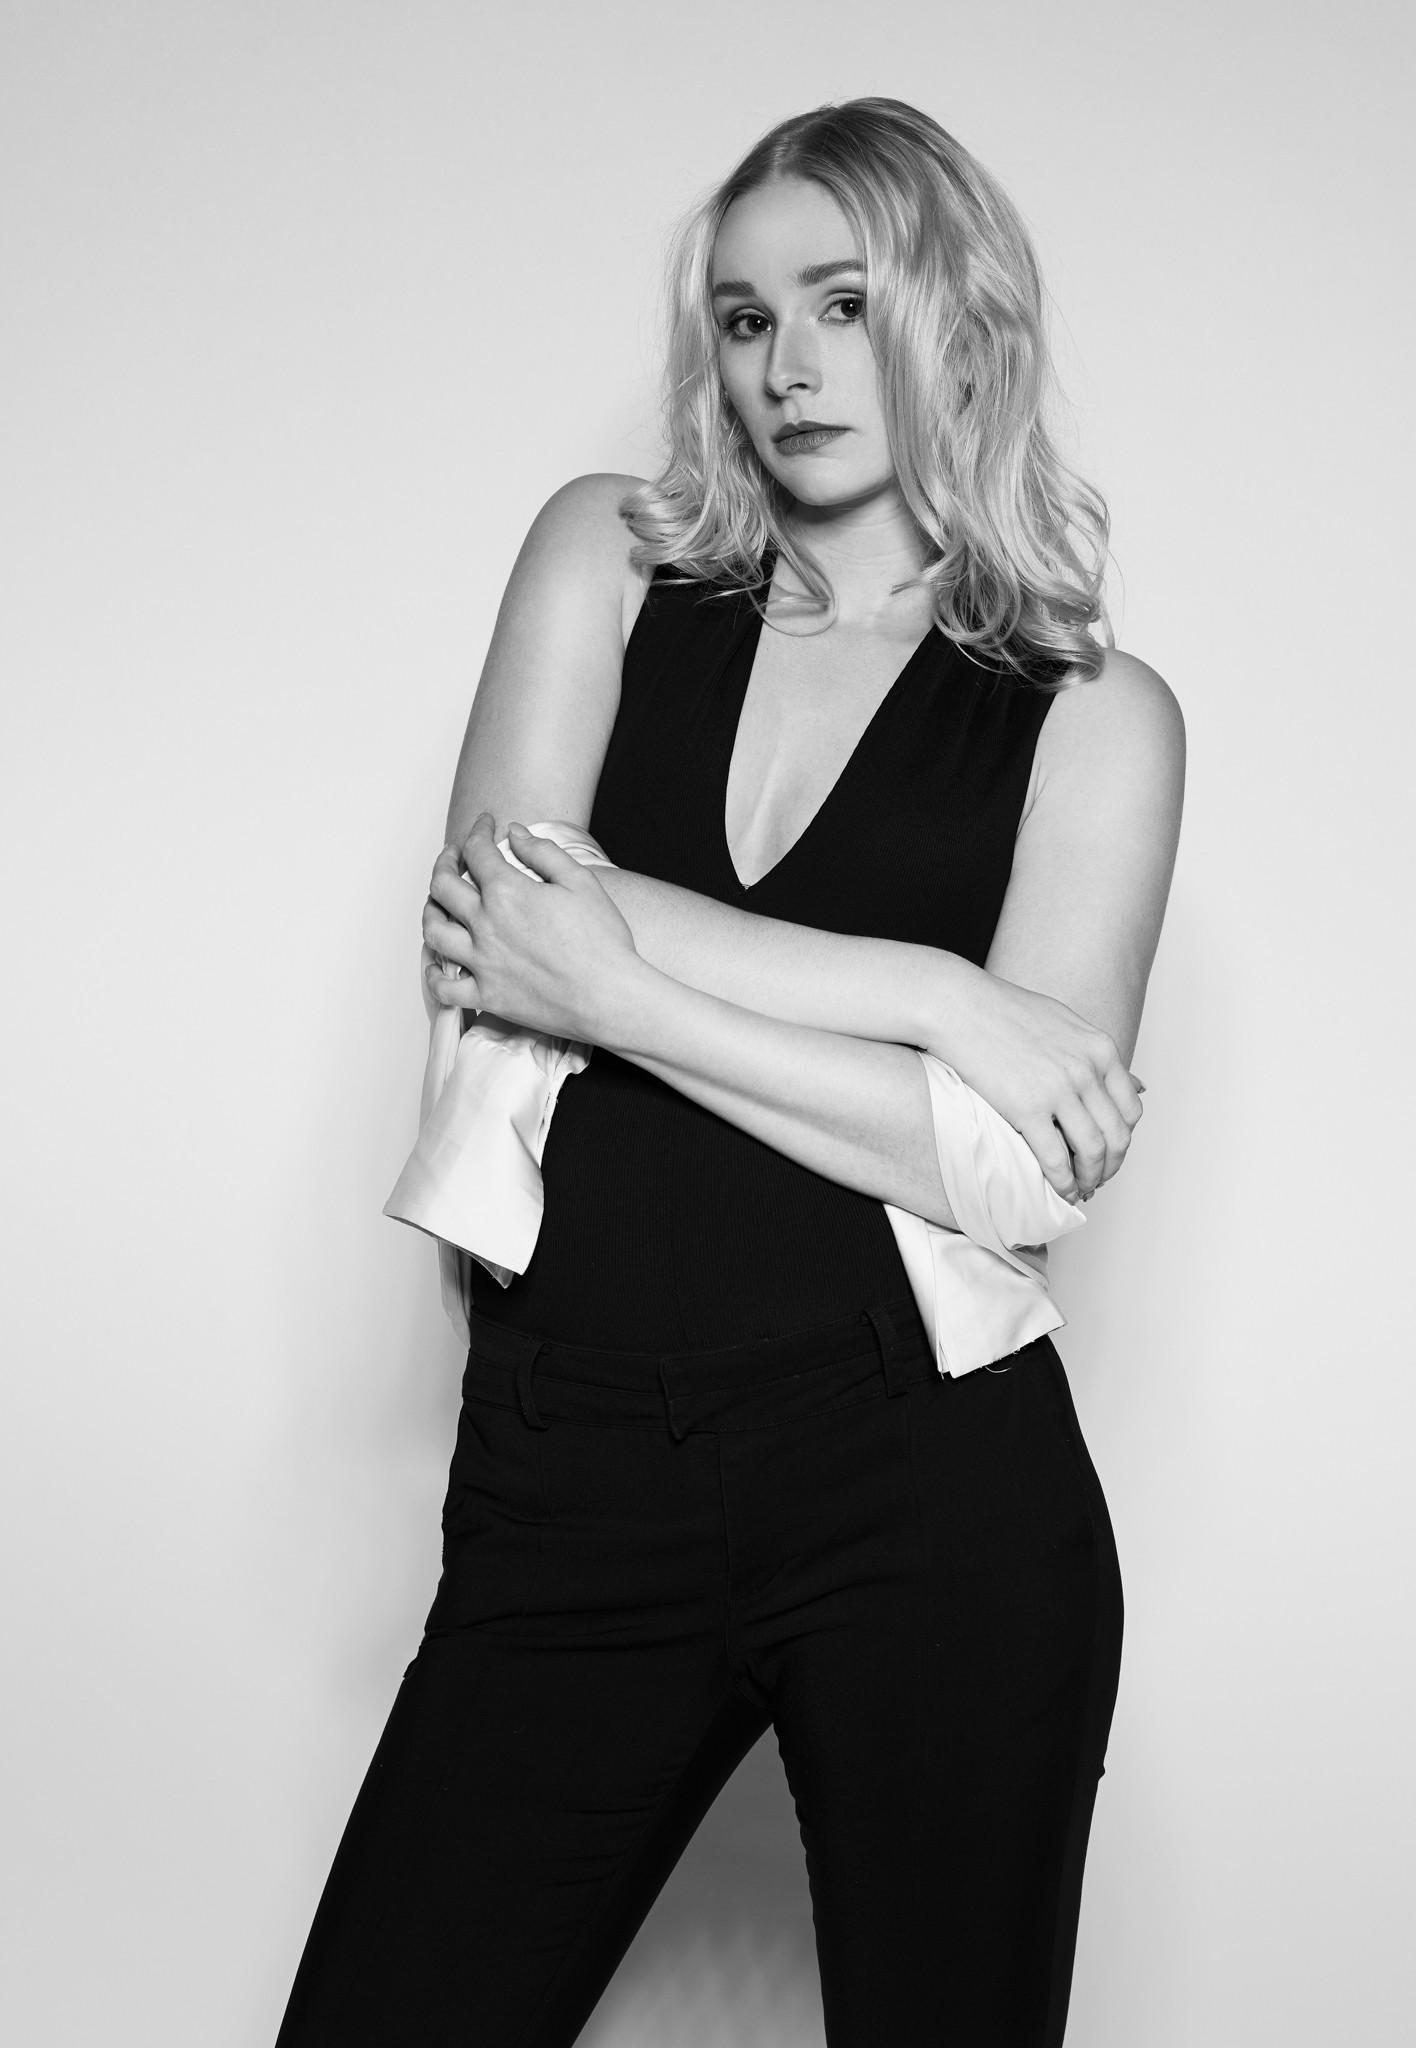 gerlinde-zwart-wit-fashion-fotografie-vrouw-jan-kruize